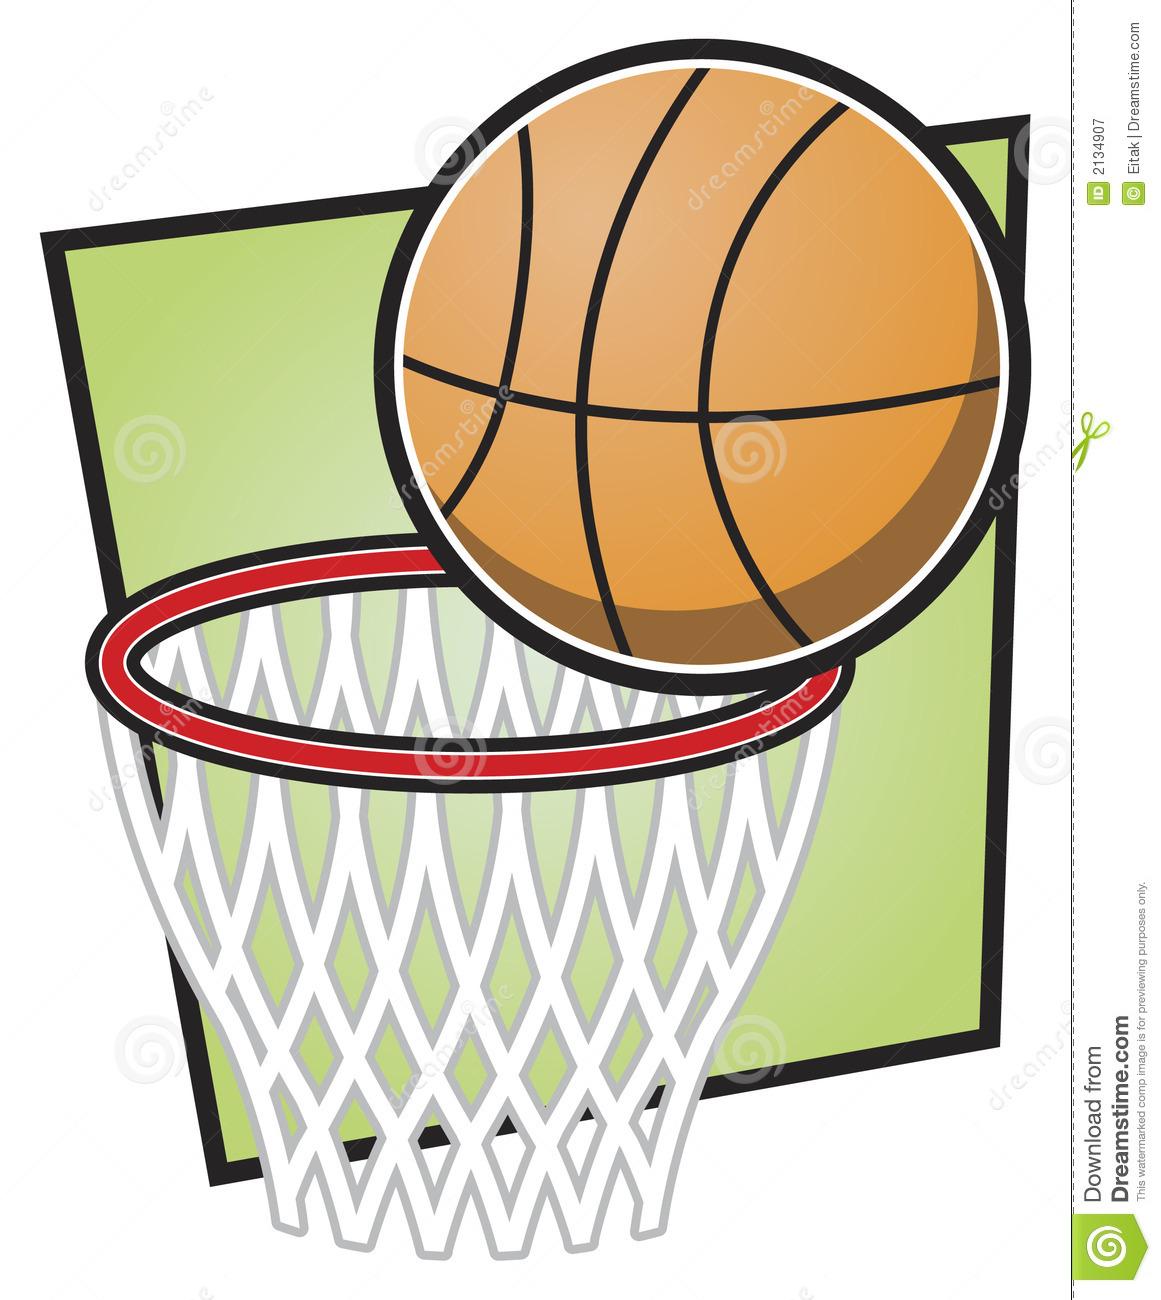 Nba Basketball Clipart